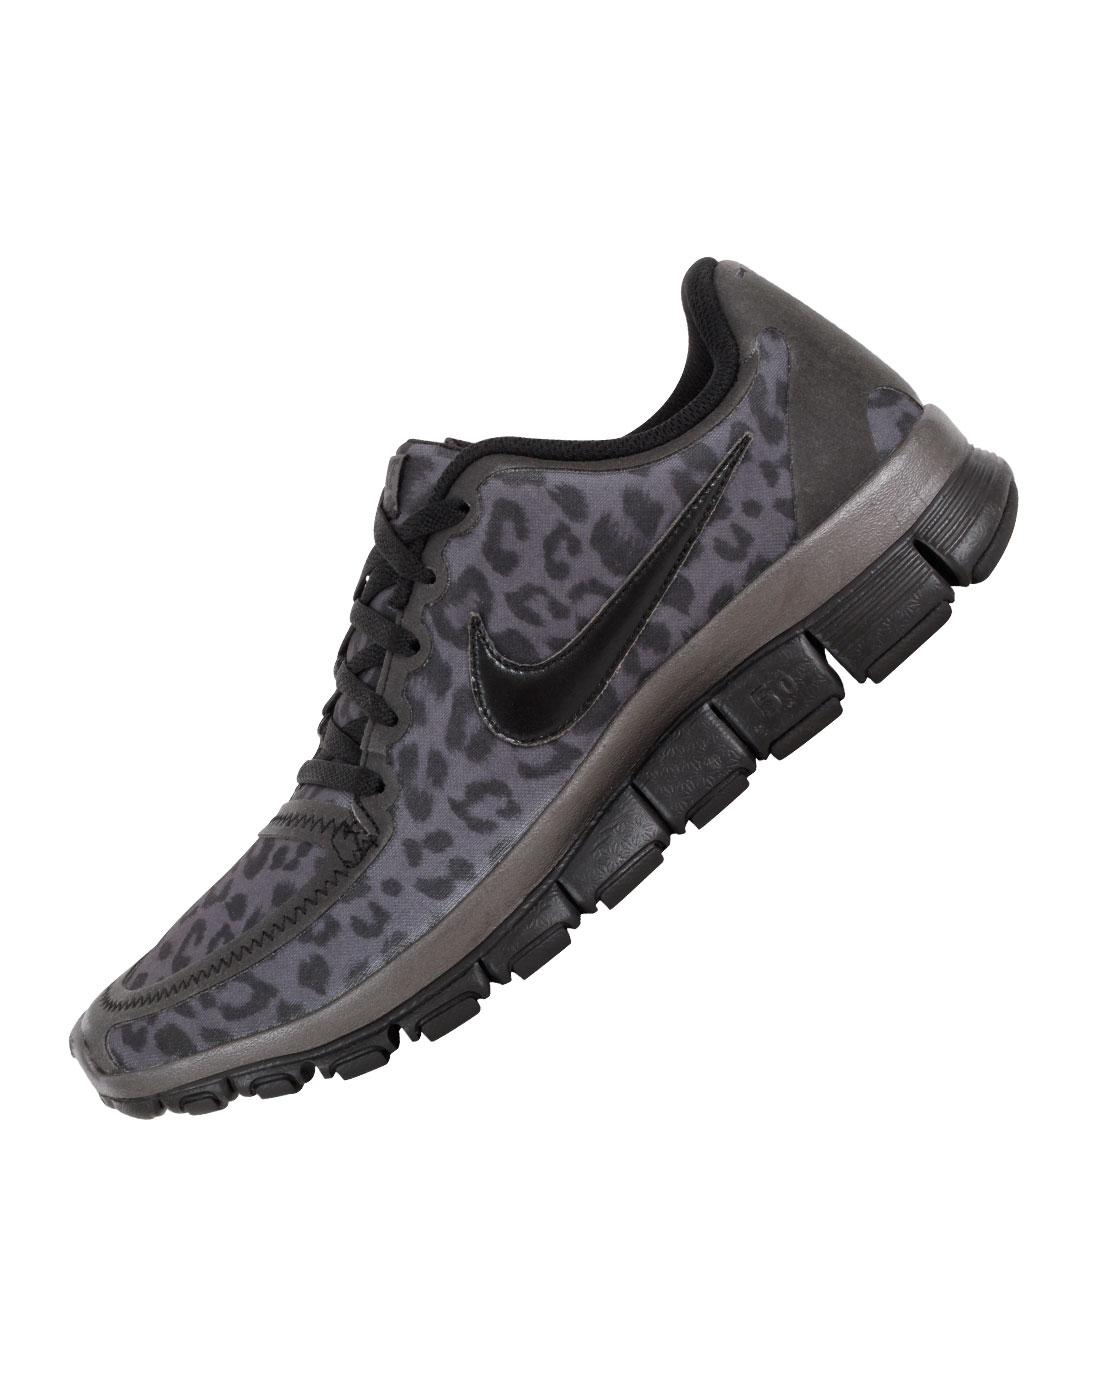 Nike Free 5.0 V4 Grey Leopard - Musée des impressionnismes Giverny 0cac41146e